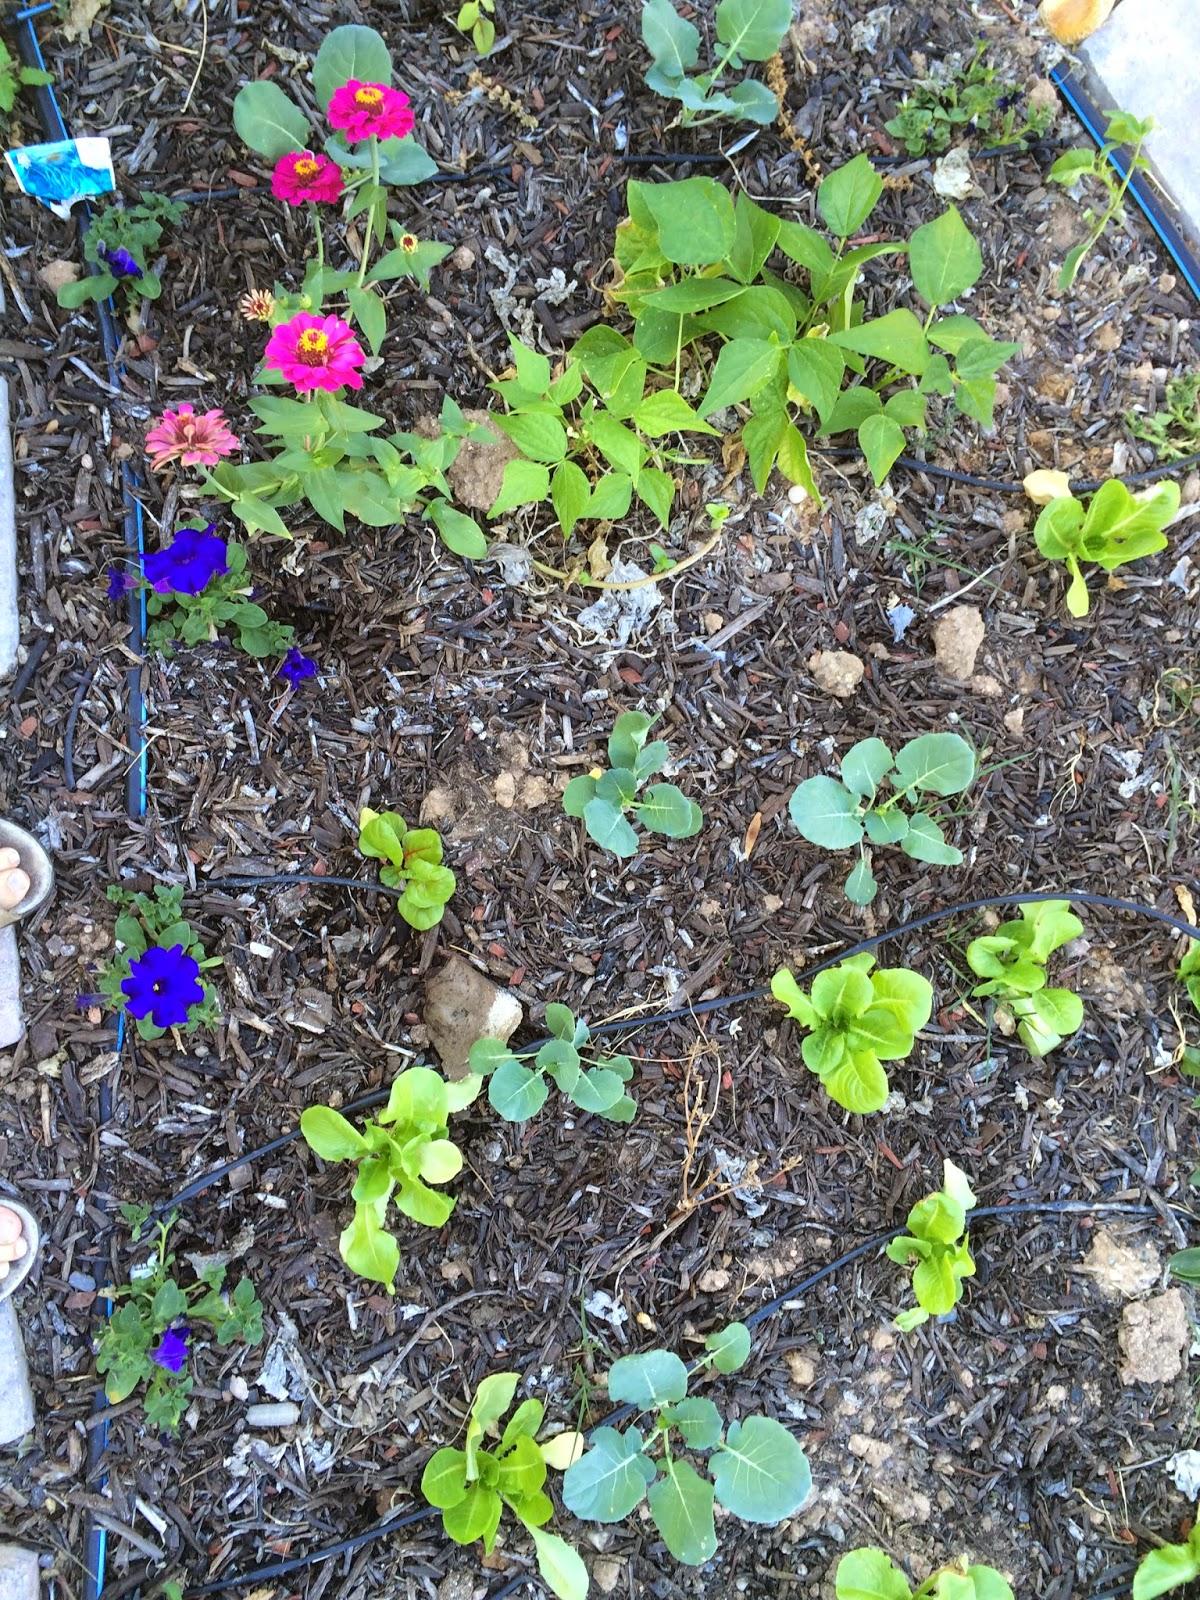 Arizona Backyard Eden: November gardening